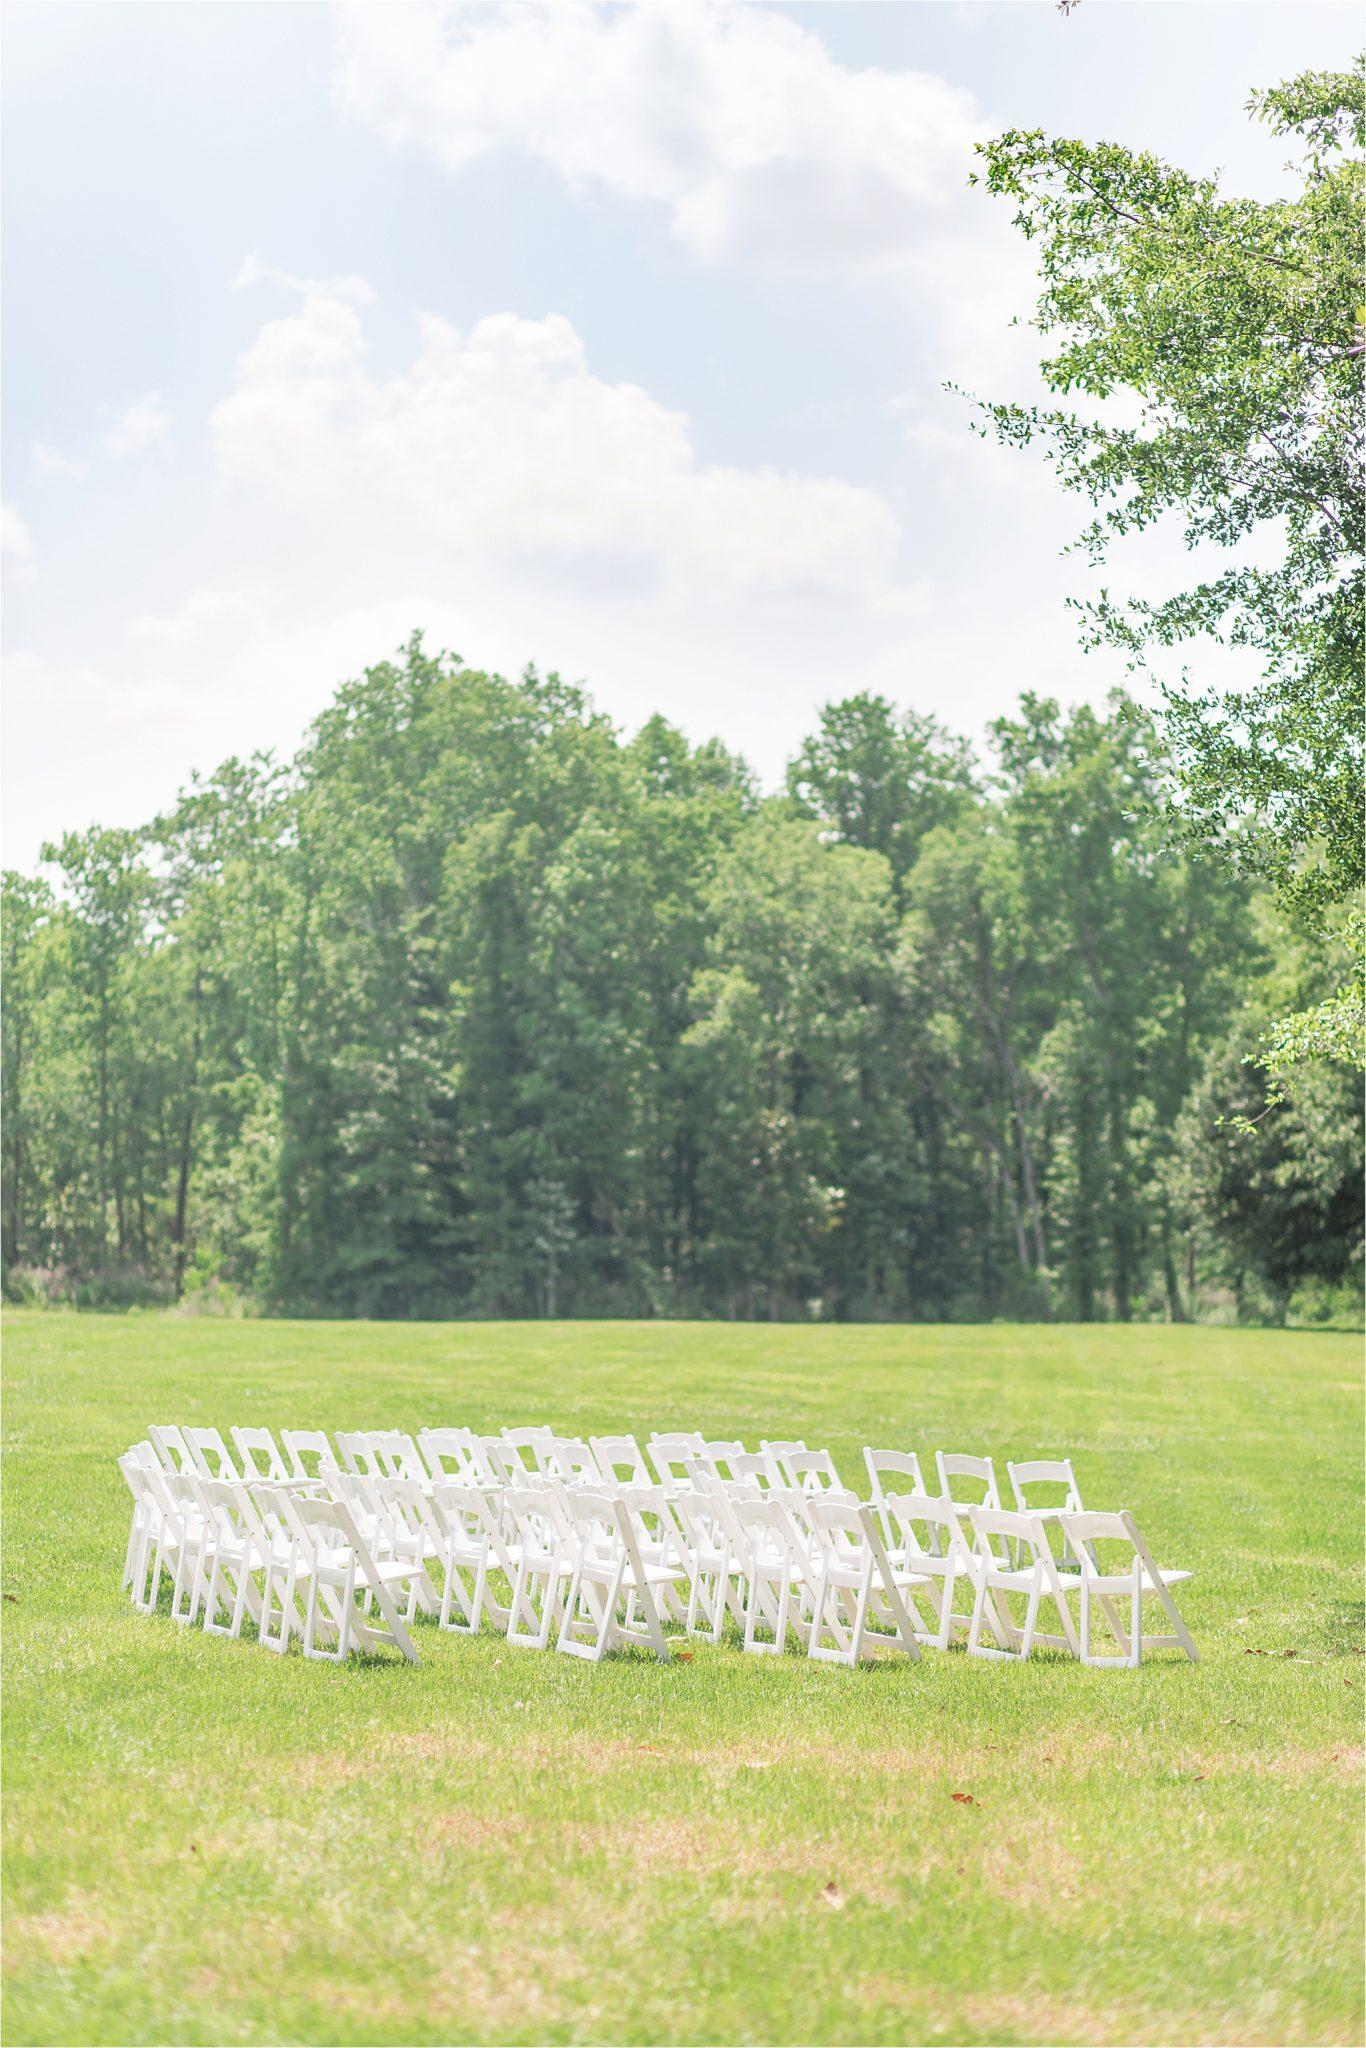 backyard-country-wedding-budget-white chairs-wedding chairs-open feild